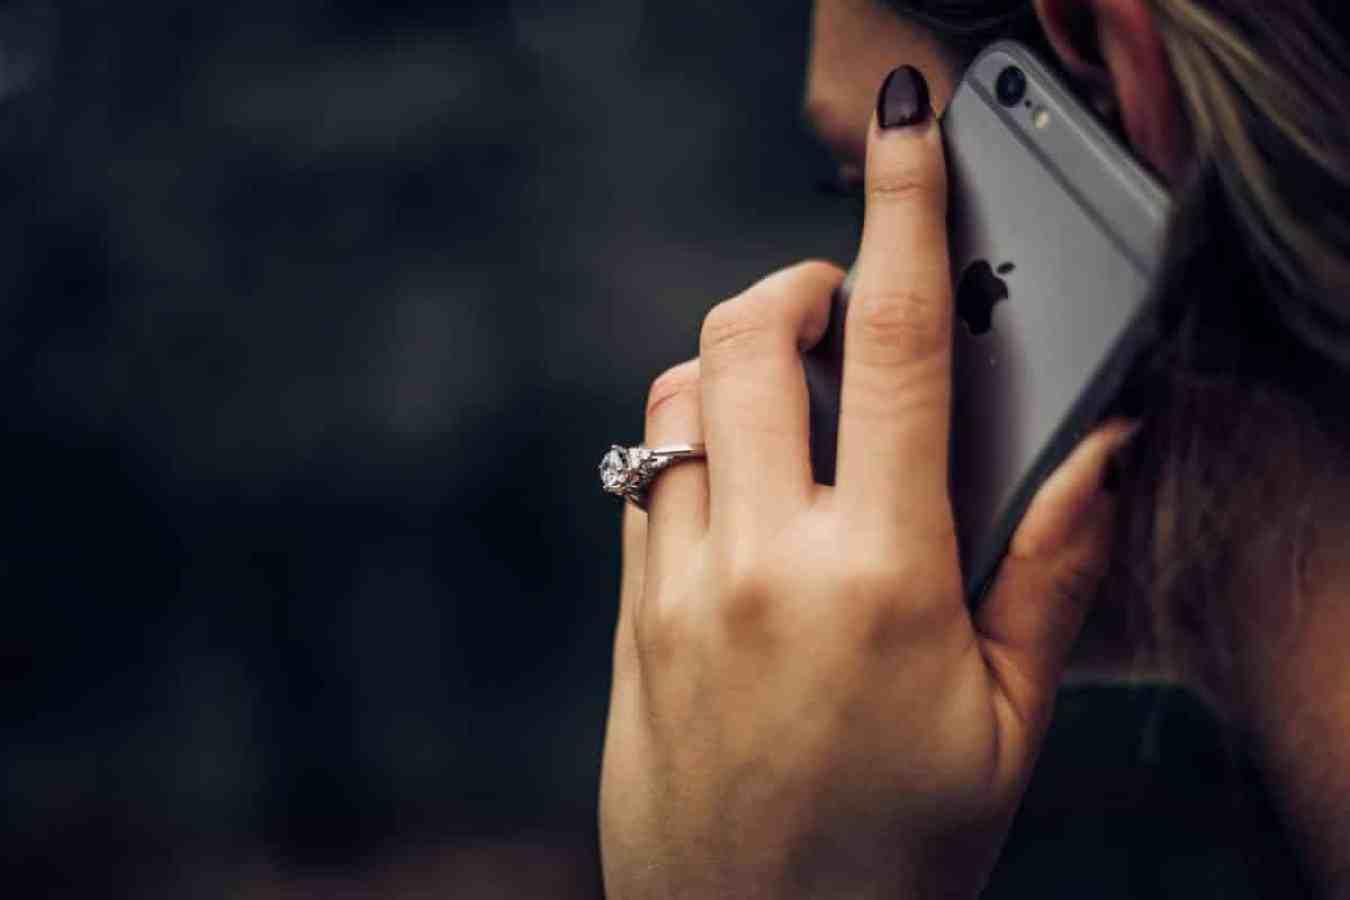 woman taking a phone call